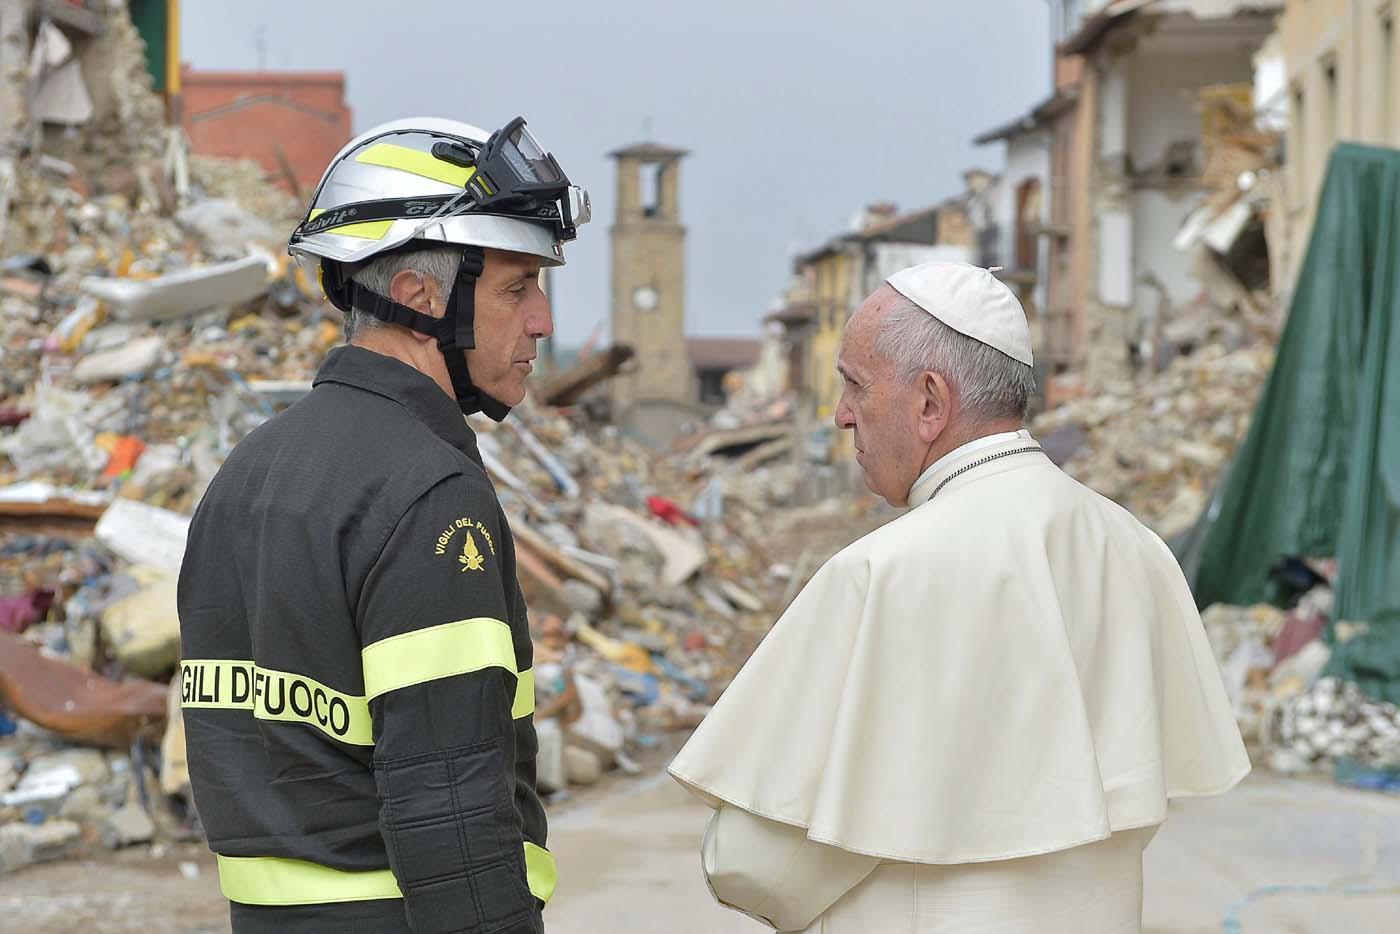 2016-10-04T084638Z_1151397759_S1BEUEZTBAAB_RTRMADP_3_POPE-AMATRICE-QUAKE